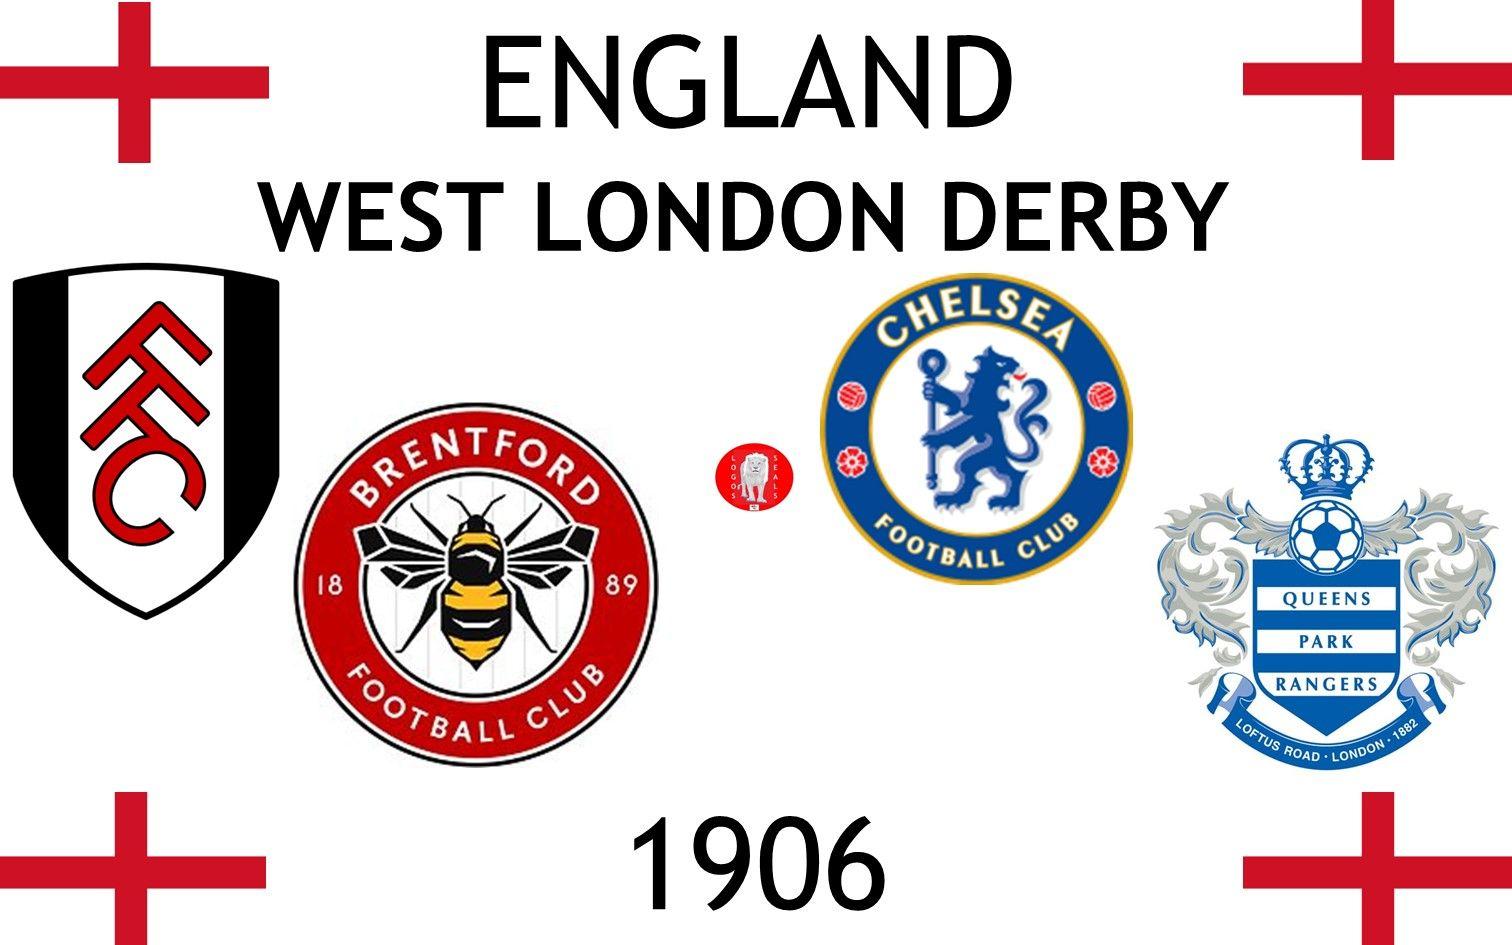 England (1st WEST LONDON DERBY), Brentford F.C., Chelsea F.C., Fulham  F.C., Queens Park Rangers F.C